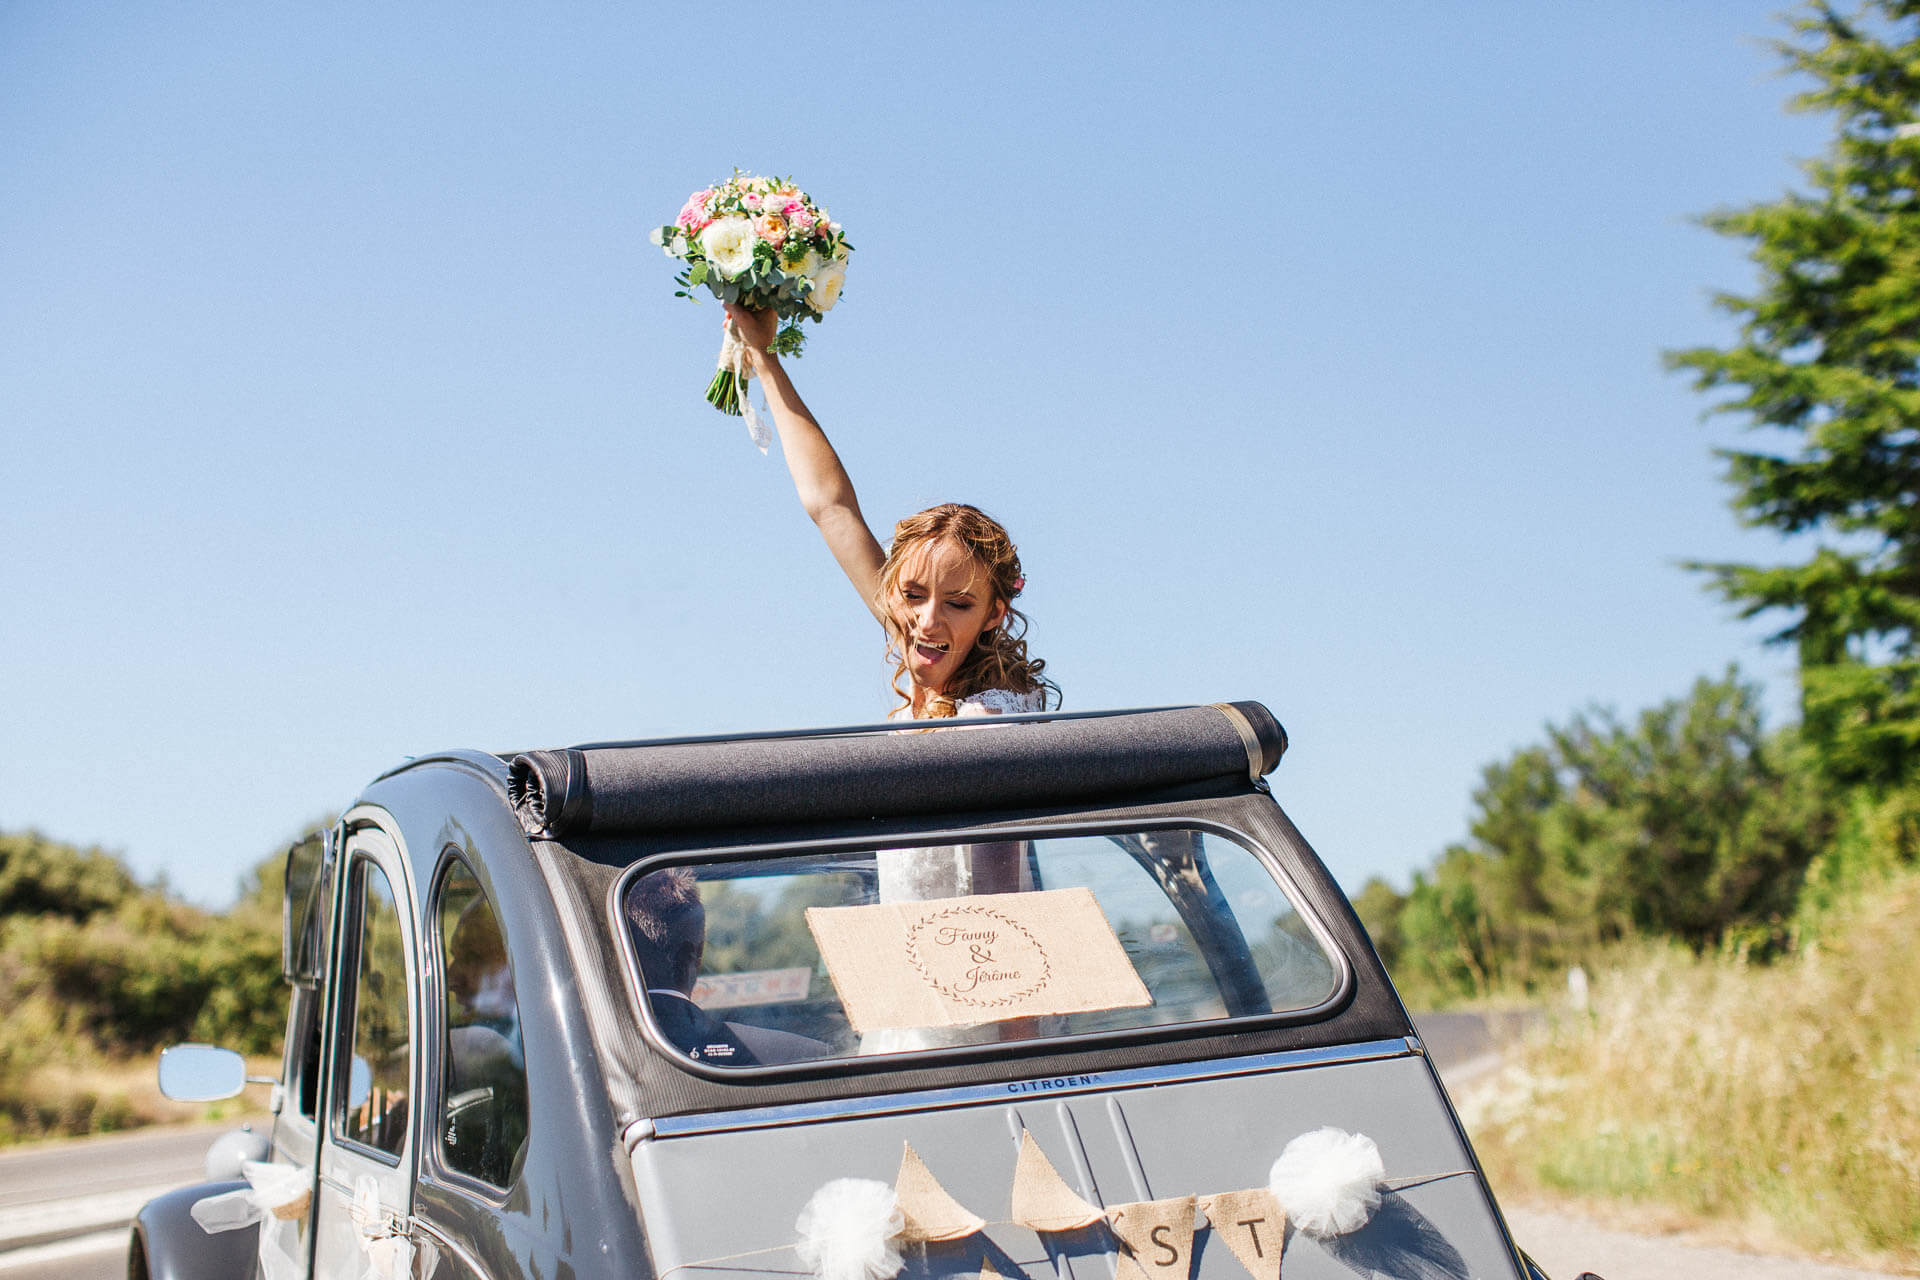 photographe-mariage-aix-en-provence-stephanie-jerome-8